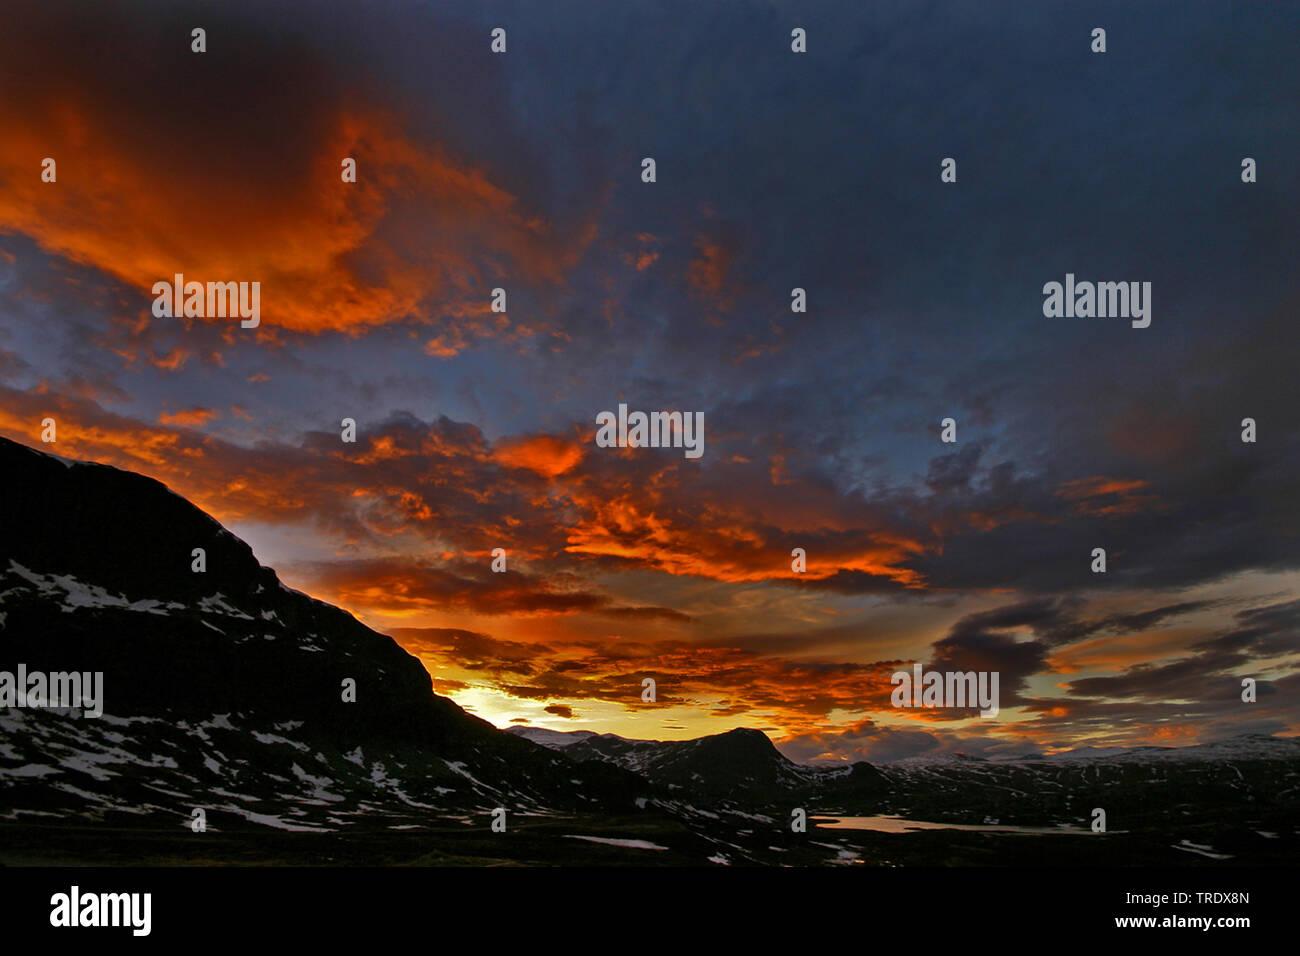 Valdresflya bei Sonnenuntergang, Norwegen, Valdresflya | Valdresflya at sunset, Norway, Valdresflya | BLWS511565.jpg [ (c) blickwinkel/AGAMI/K. Wilmer - Stock Image